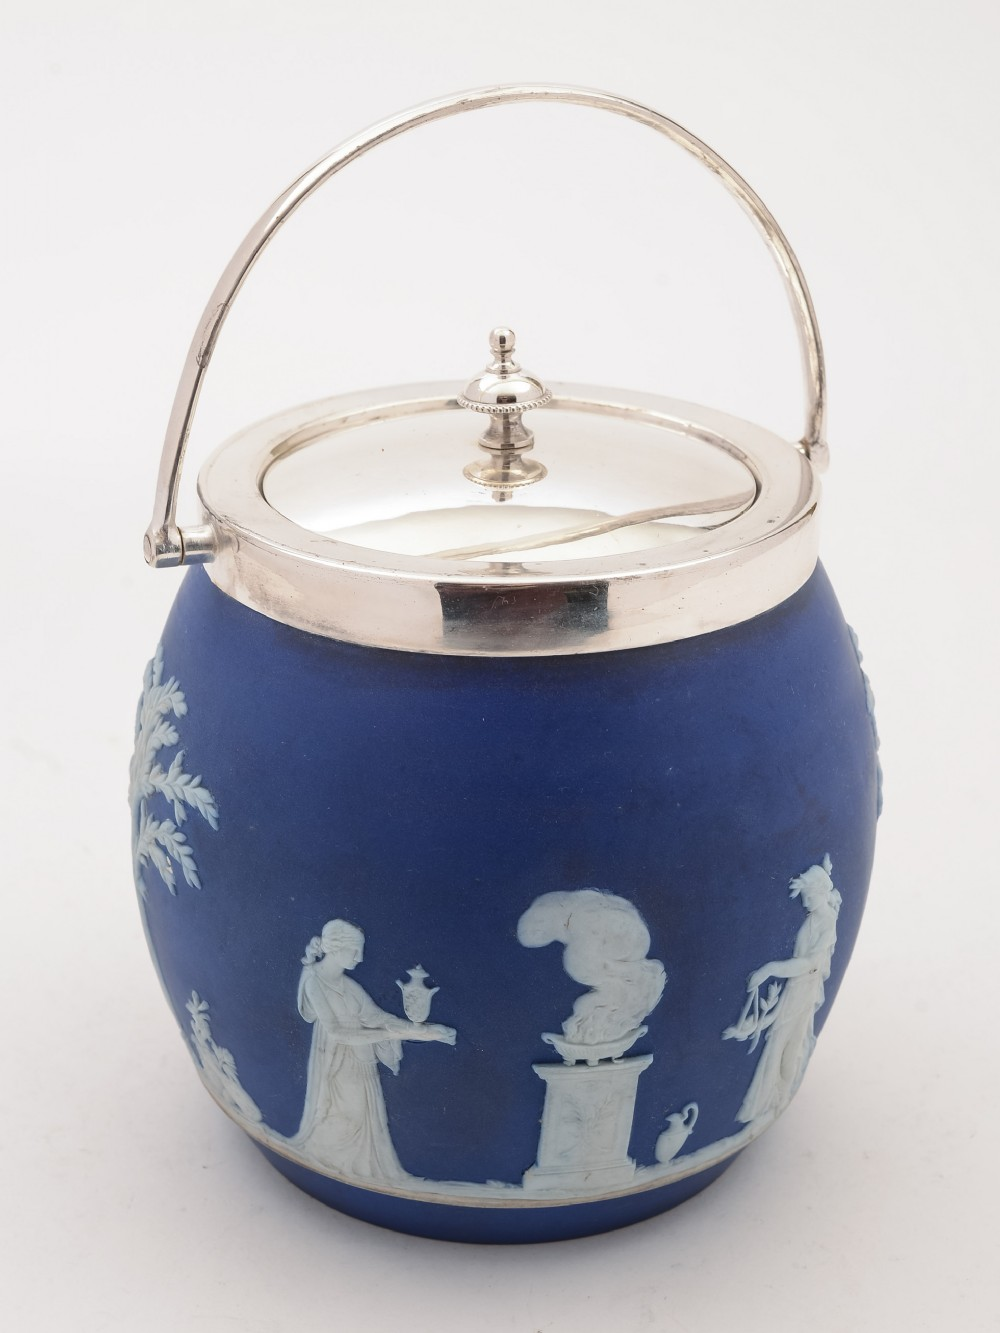 wedgwood blue jasperware biscuit barrel circa 1900